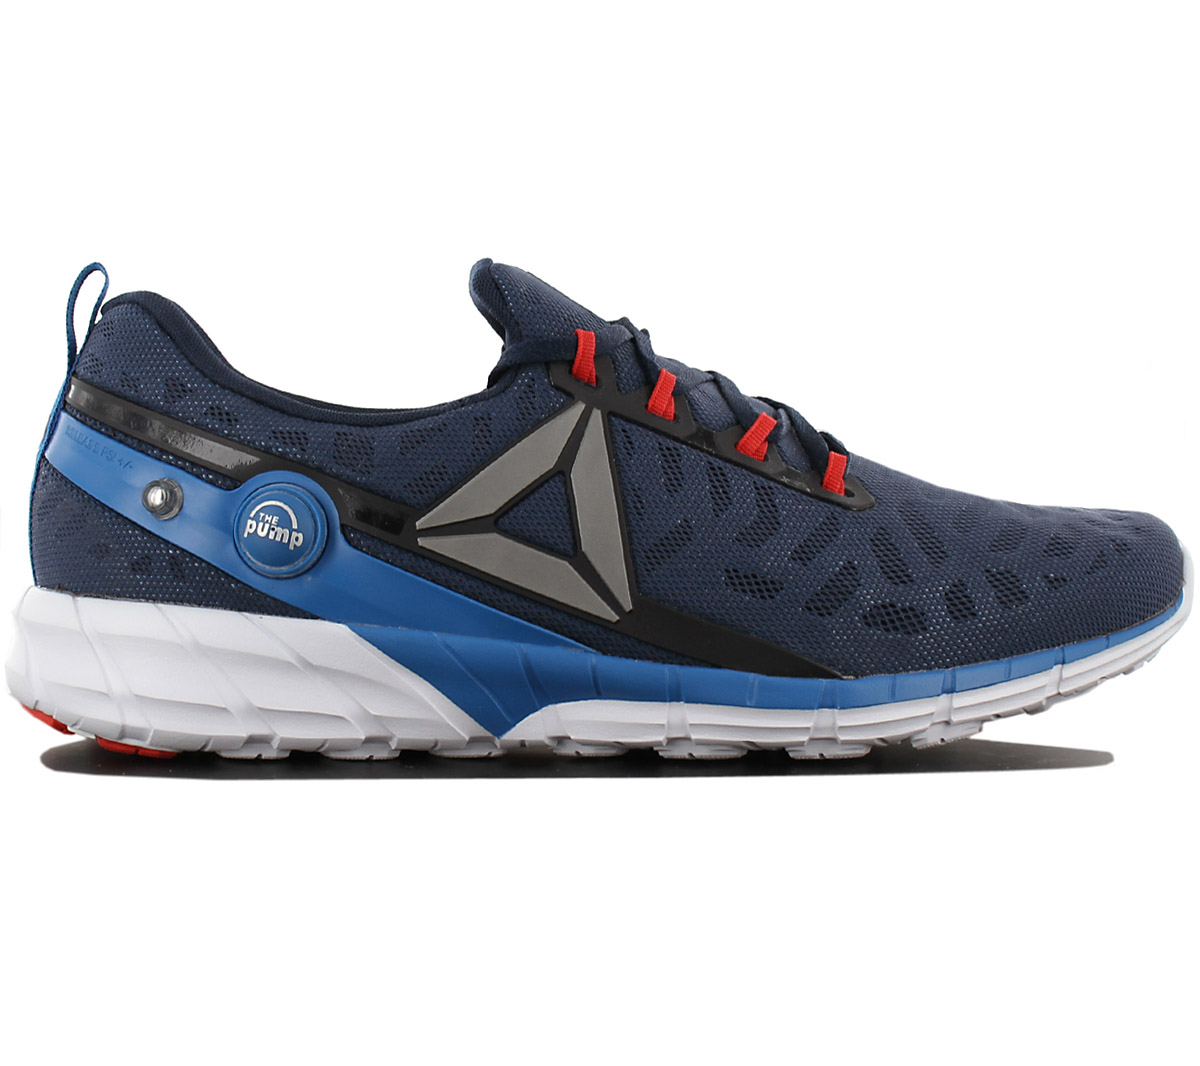 Reebok Zpump Fusion 2.5 Pump Men s Shoes Sneakers Running Sports ... bca92bef4